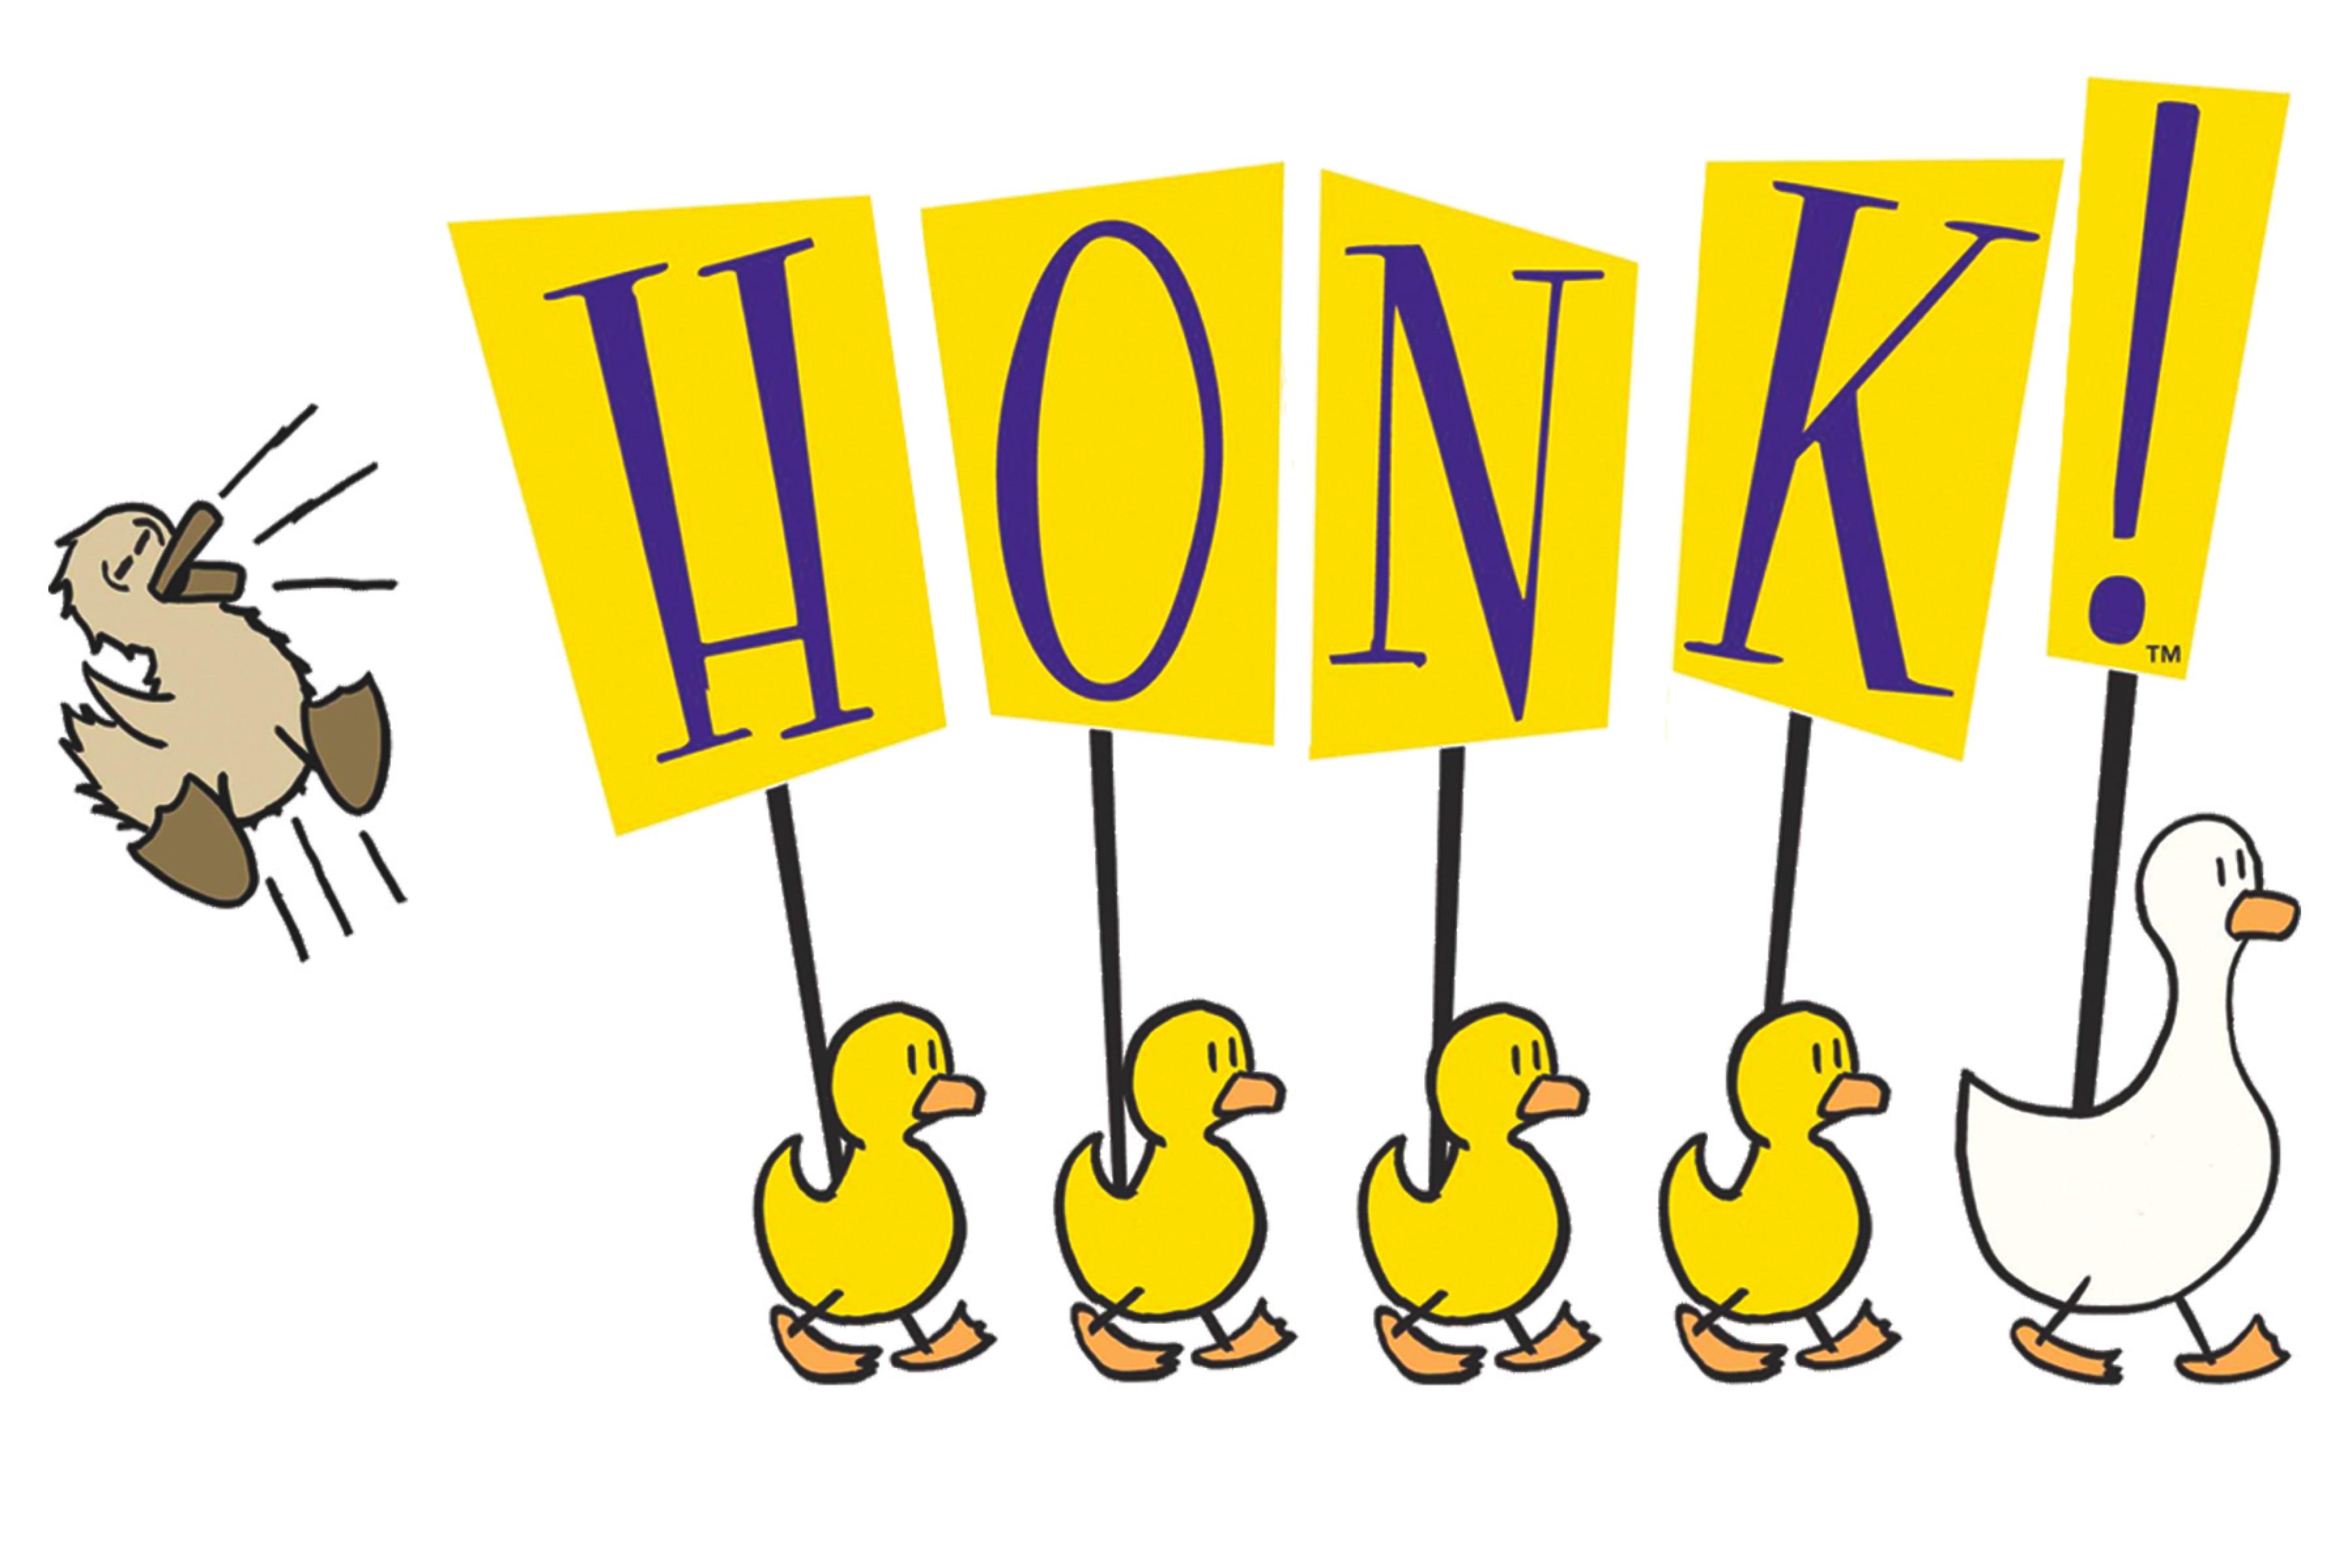 HONK-Graphic-Plain.jpg